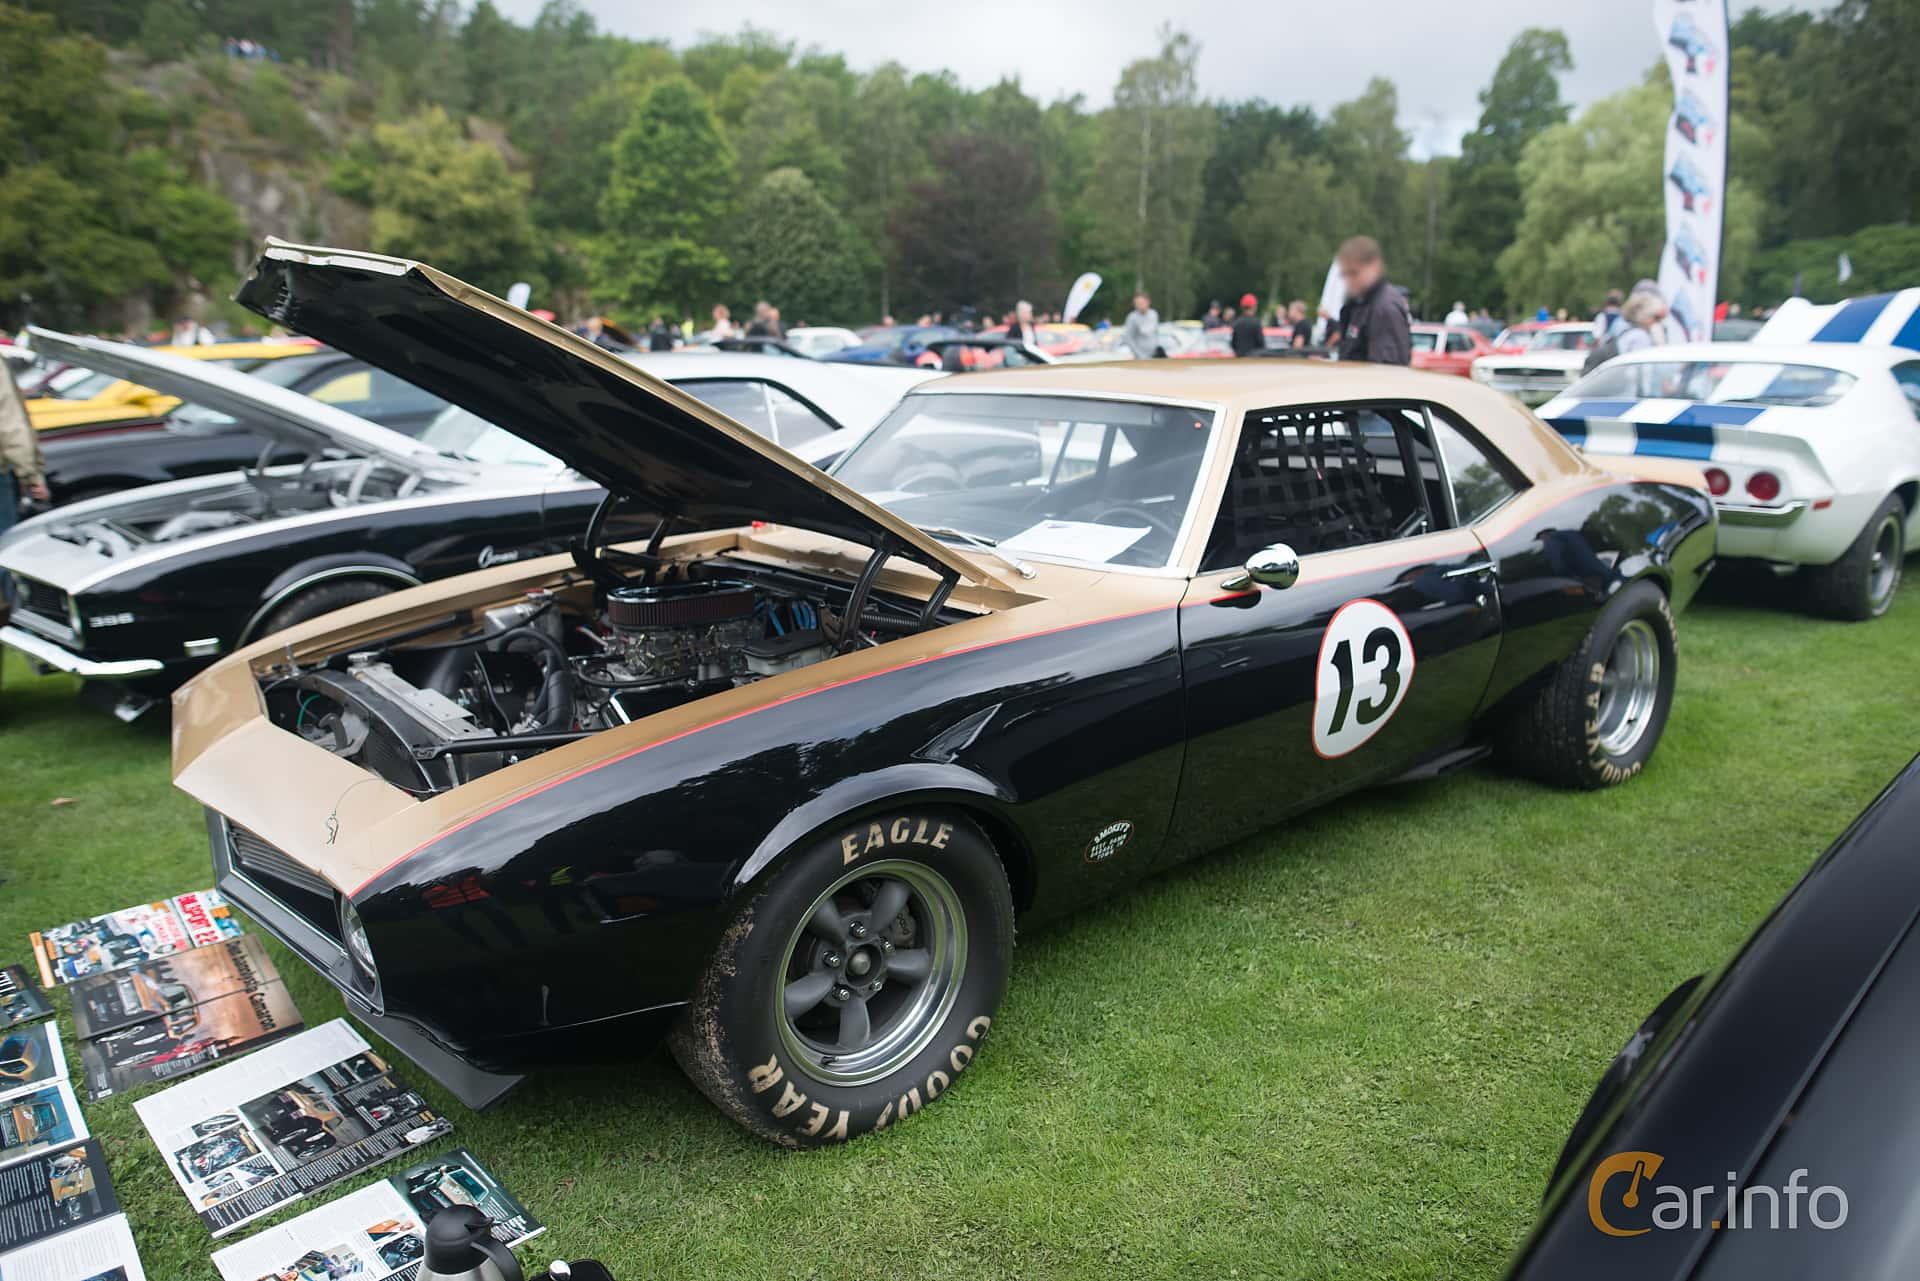 Chevrolet Camaro SS 396 6.5 V8 Manual, 381hp, 1967 at Pony & Muscle Car Meet Ronneby 2017